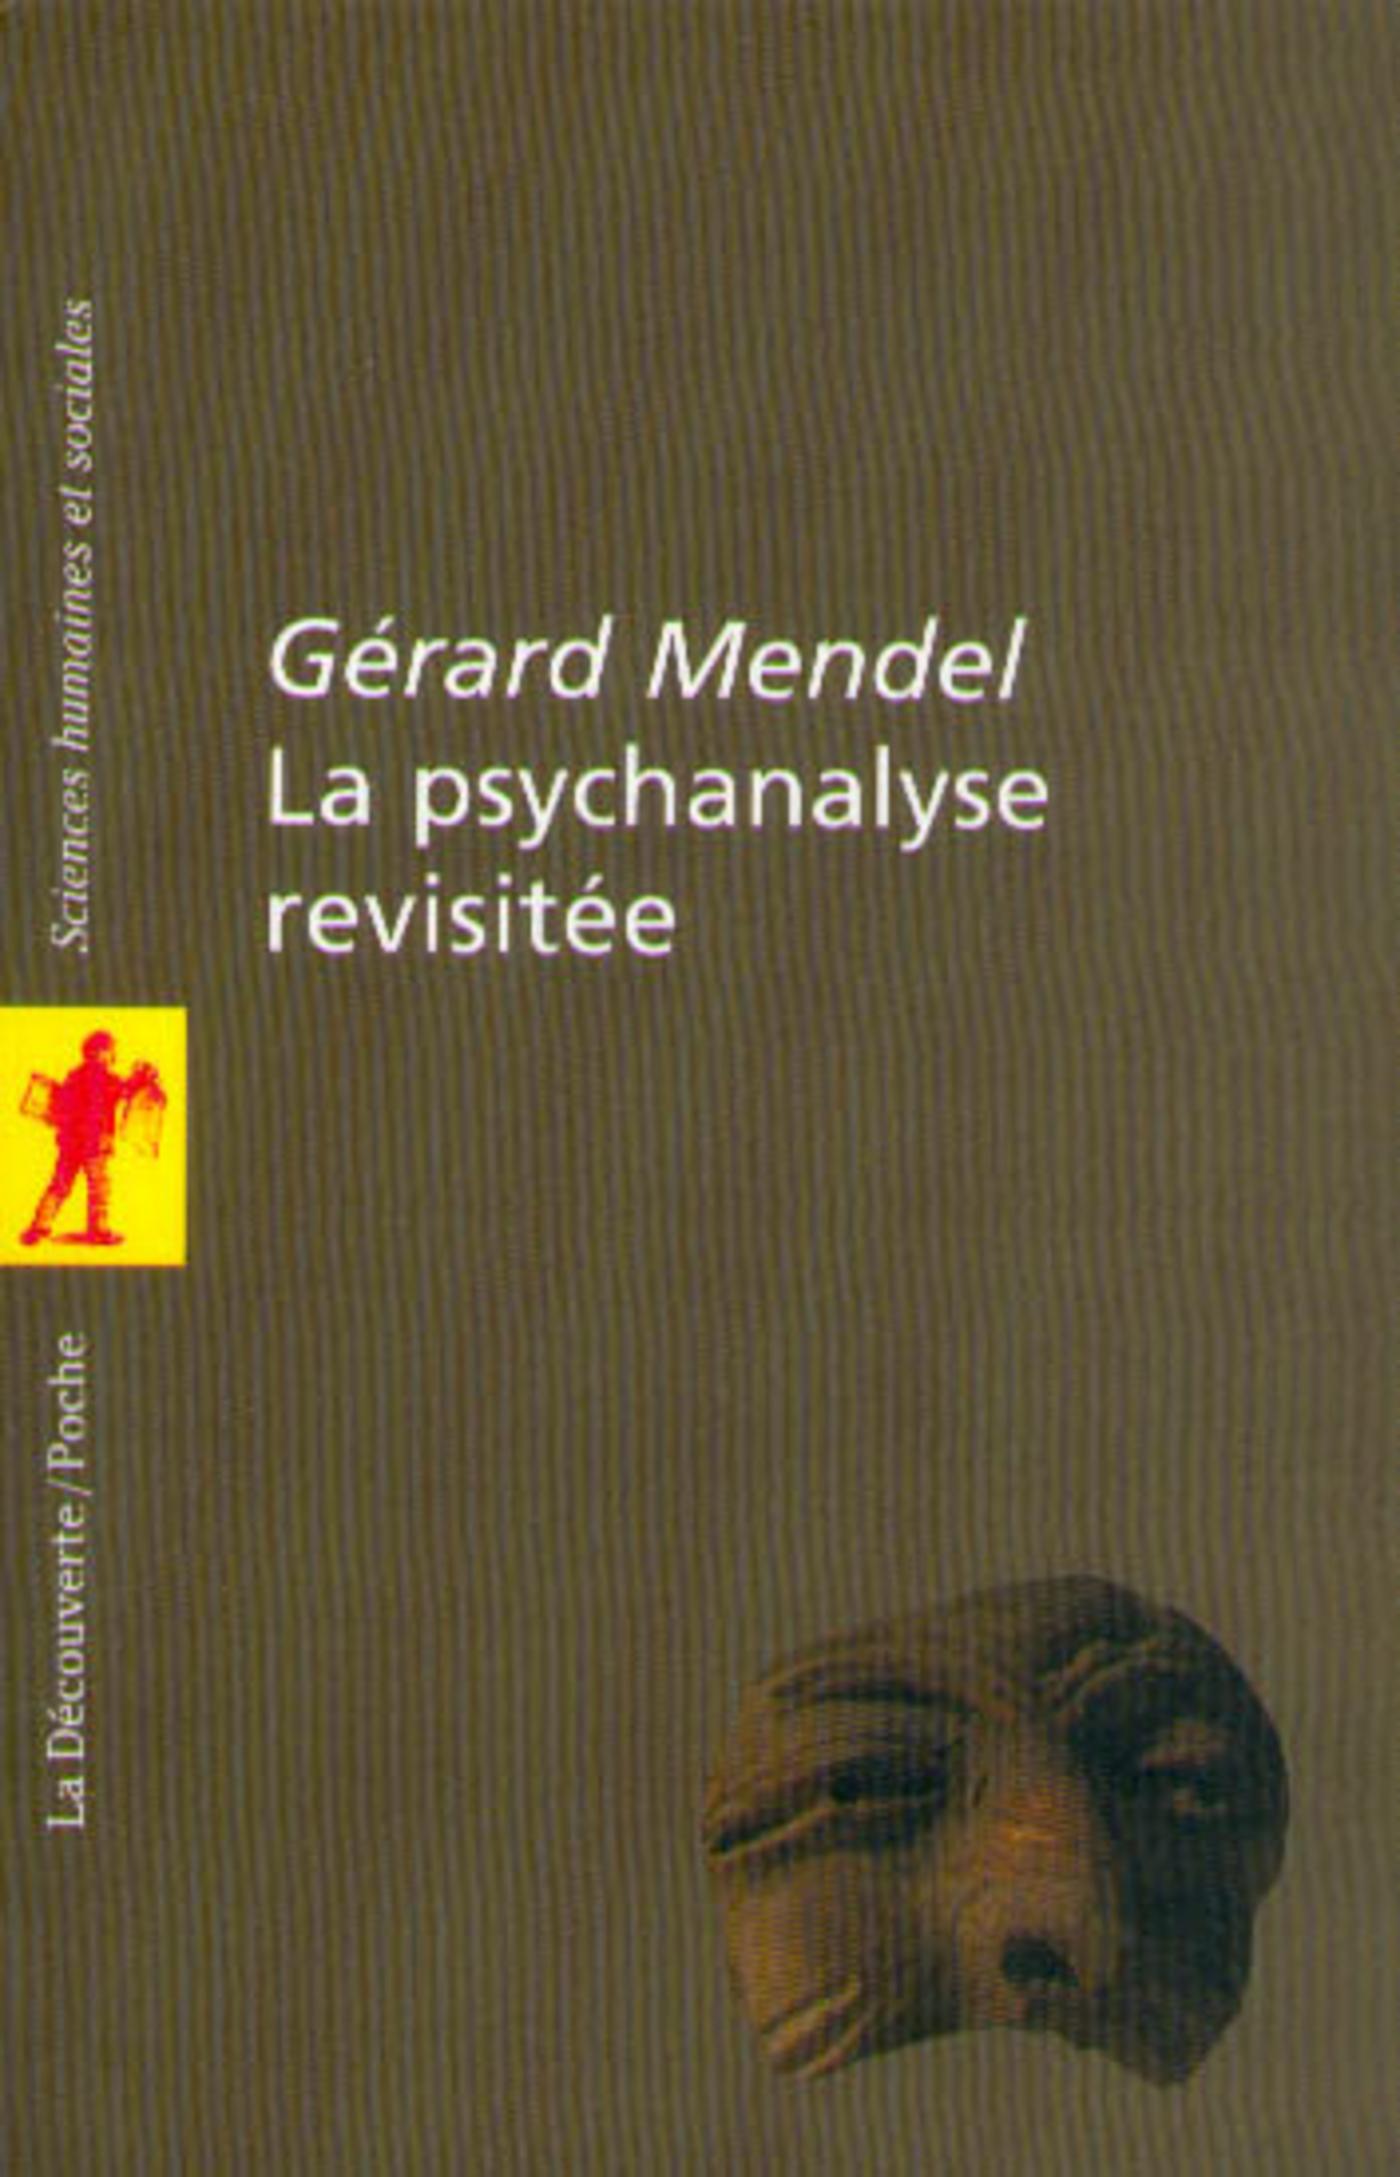 La psychanalyse revisitée (ebook)